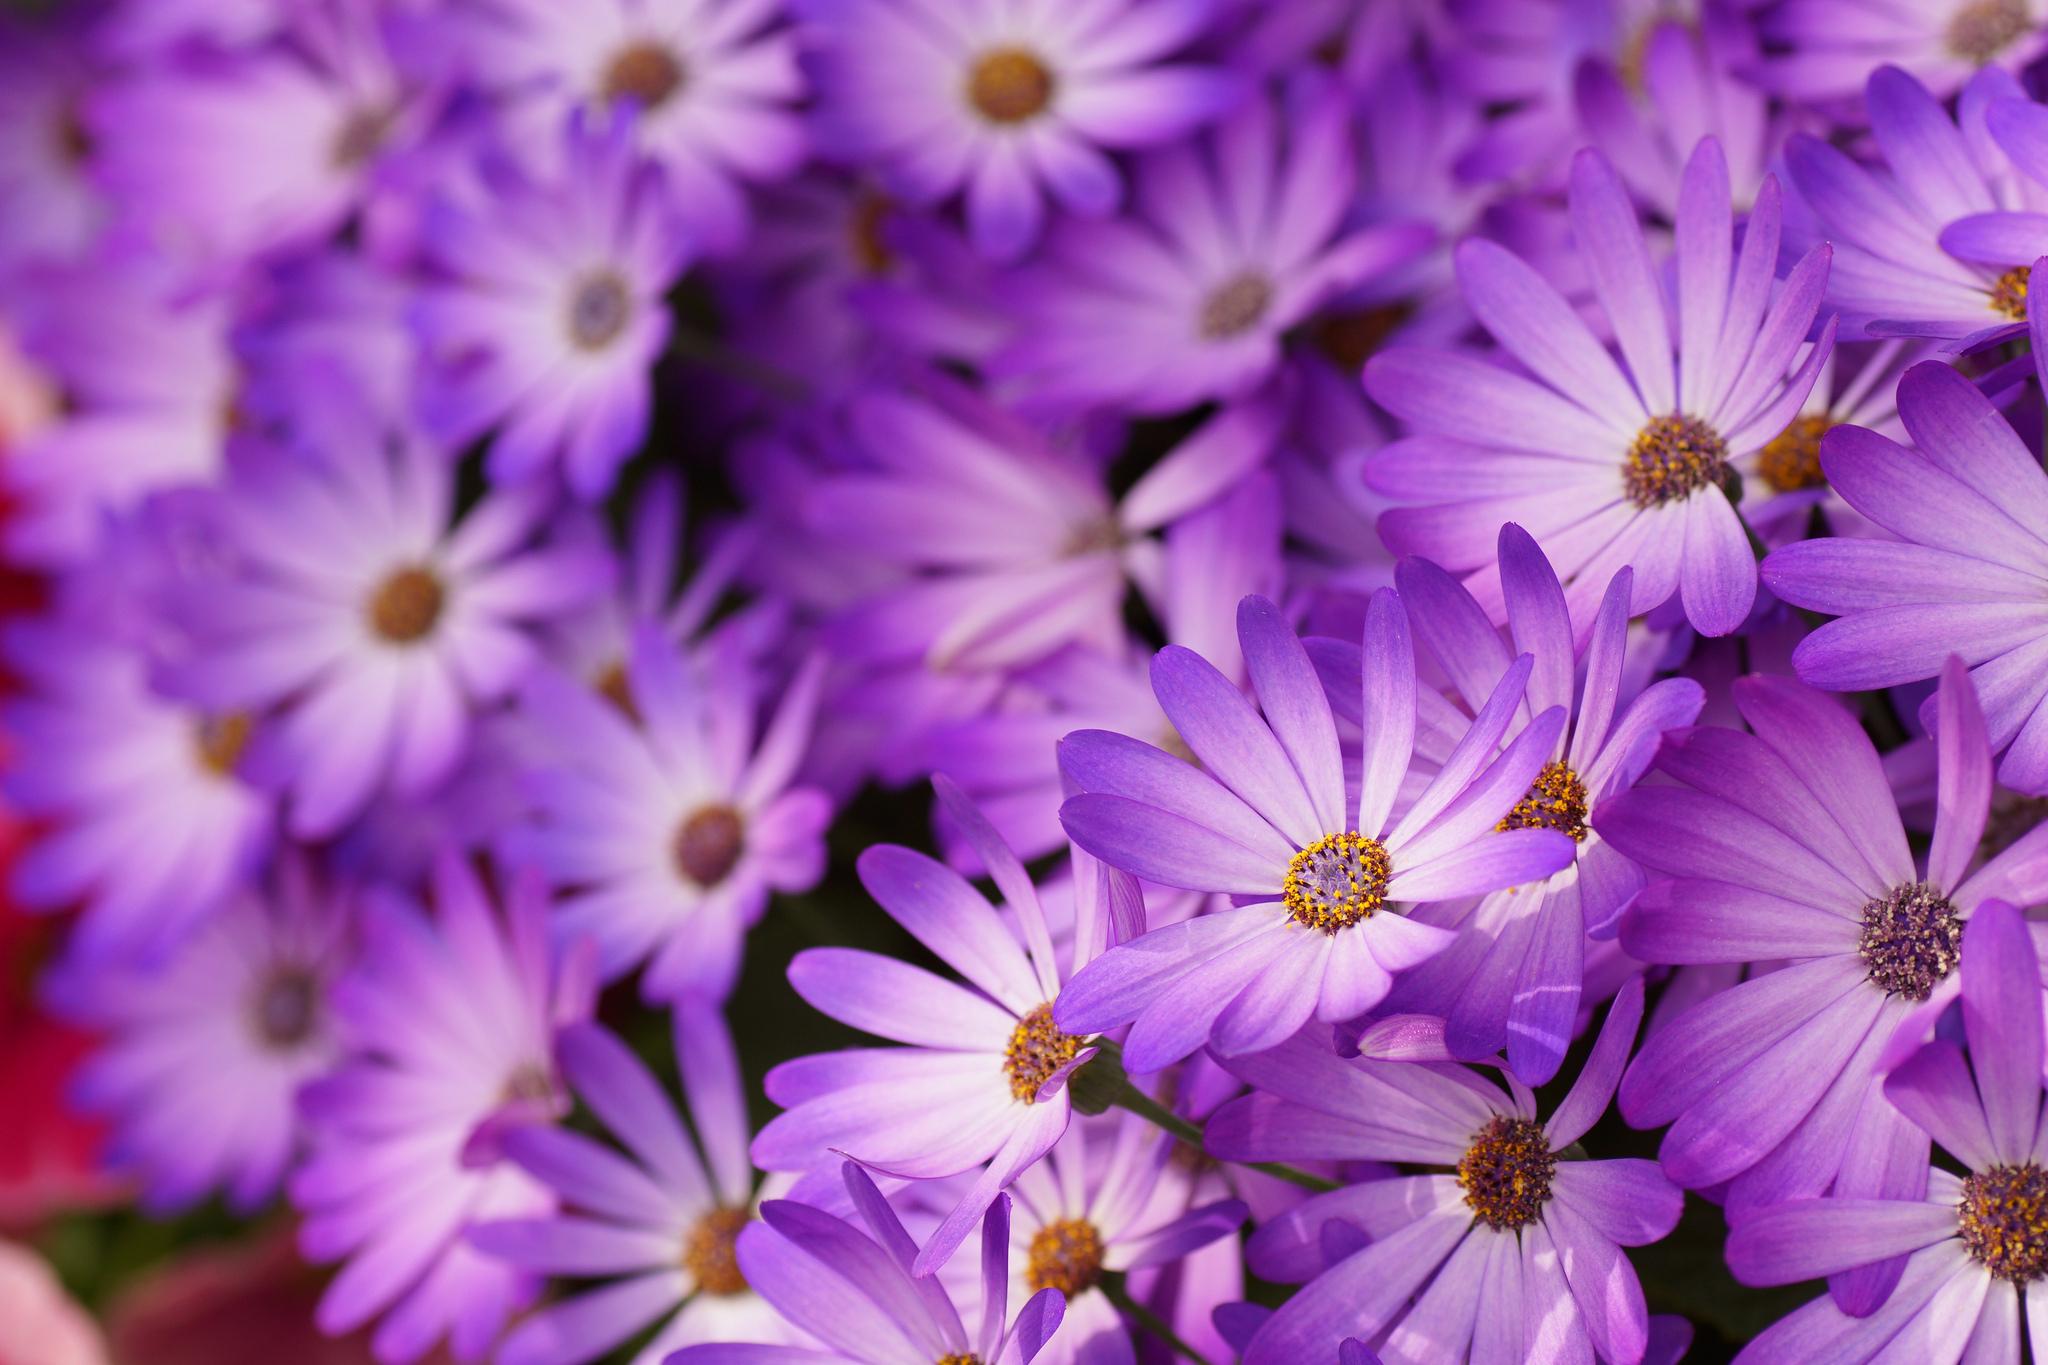 Beautiful daisy flowers in the garden wallpapers and images beautiful daisy flowers in the garden izmirmasajfo Choice Image